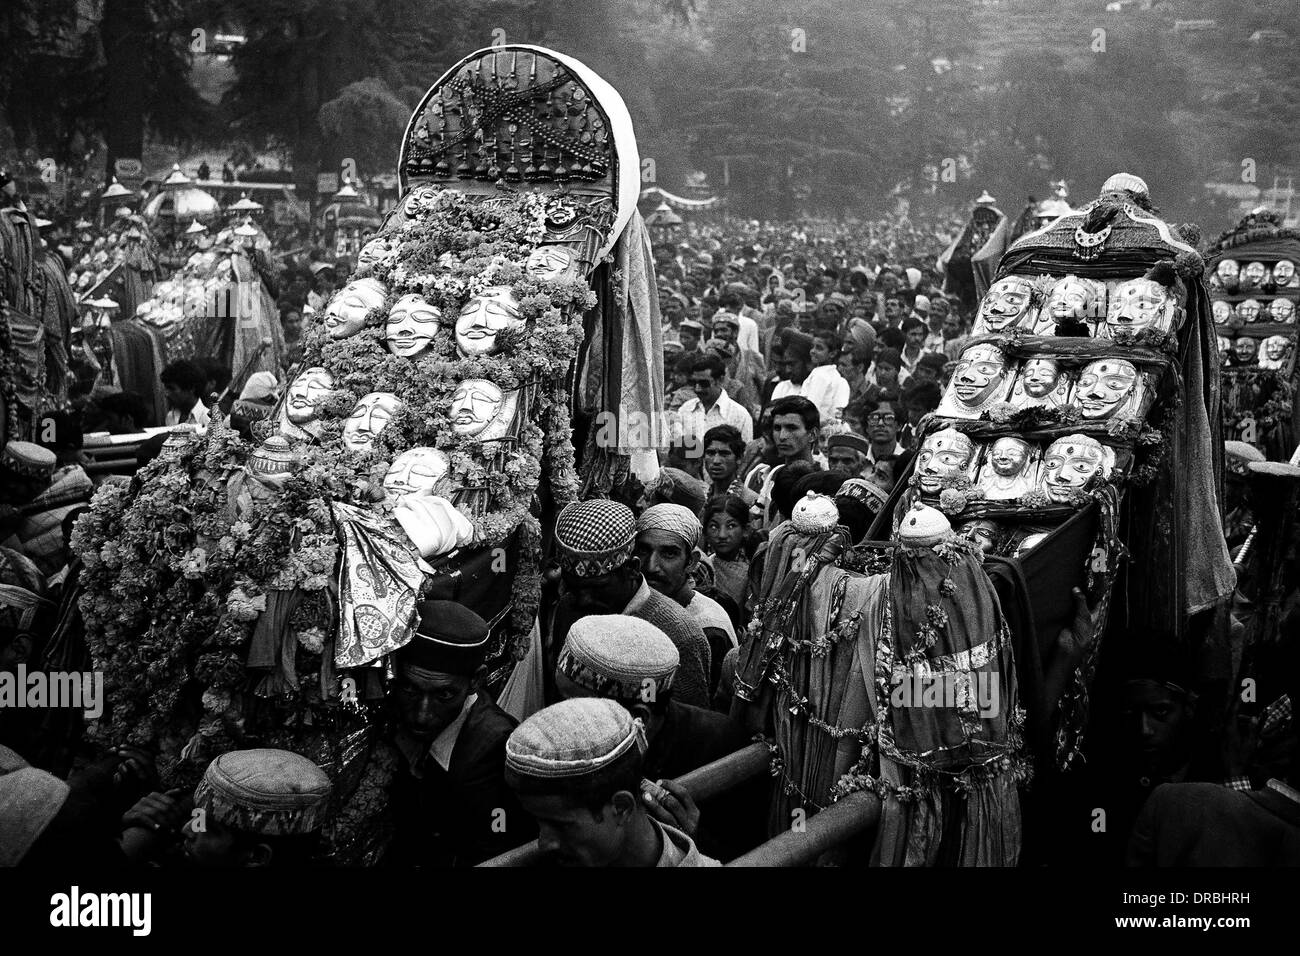 Procession of Gods on Kulu dassera festival, Himachal Pradesh, India, 1982 - Stock Image